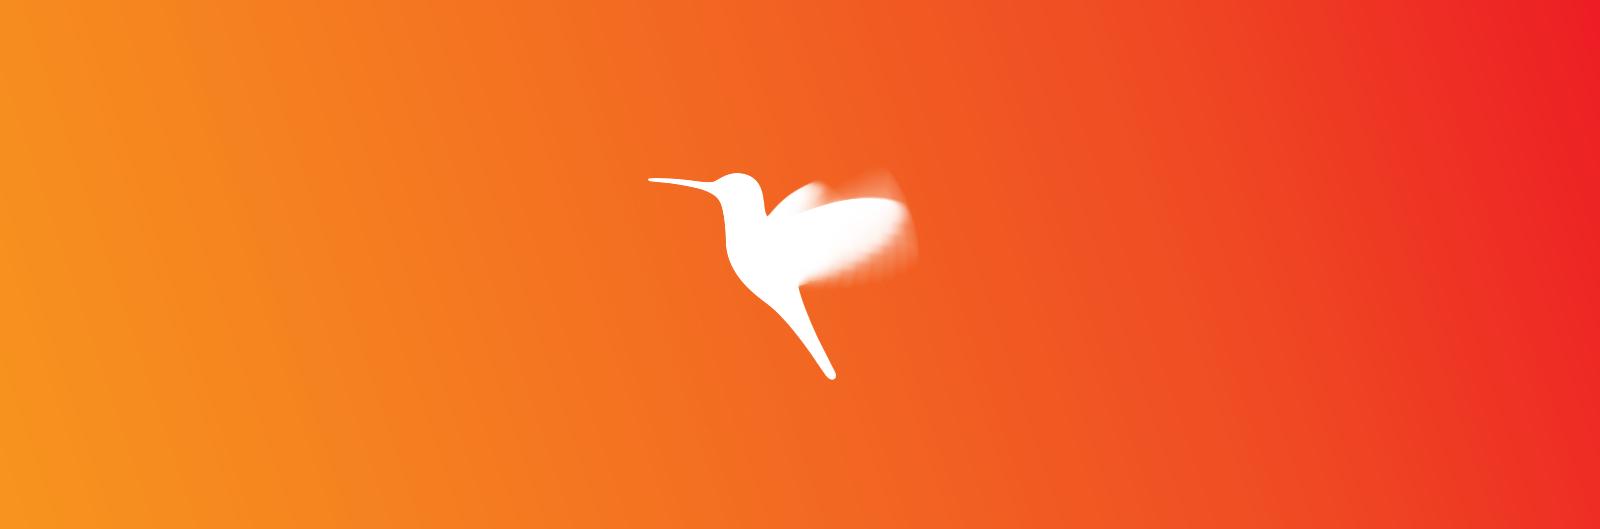 DC POS hummingbird banned